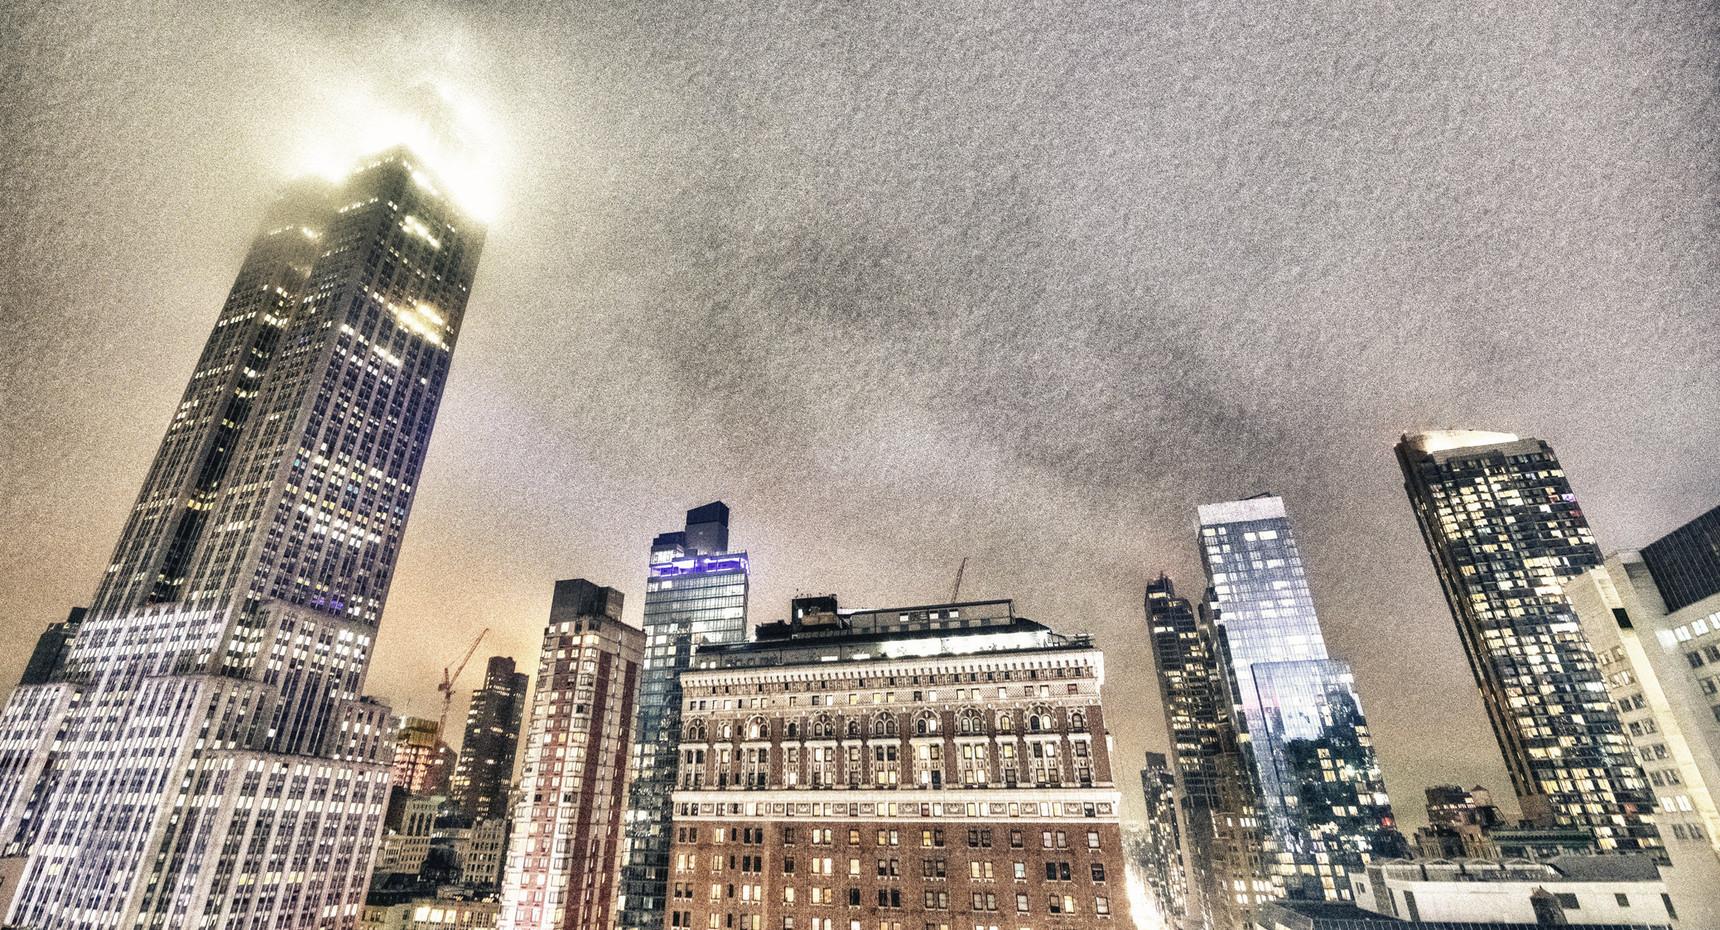 Night view of Midtown Manhattan skyline